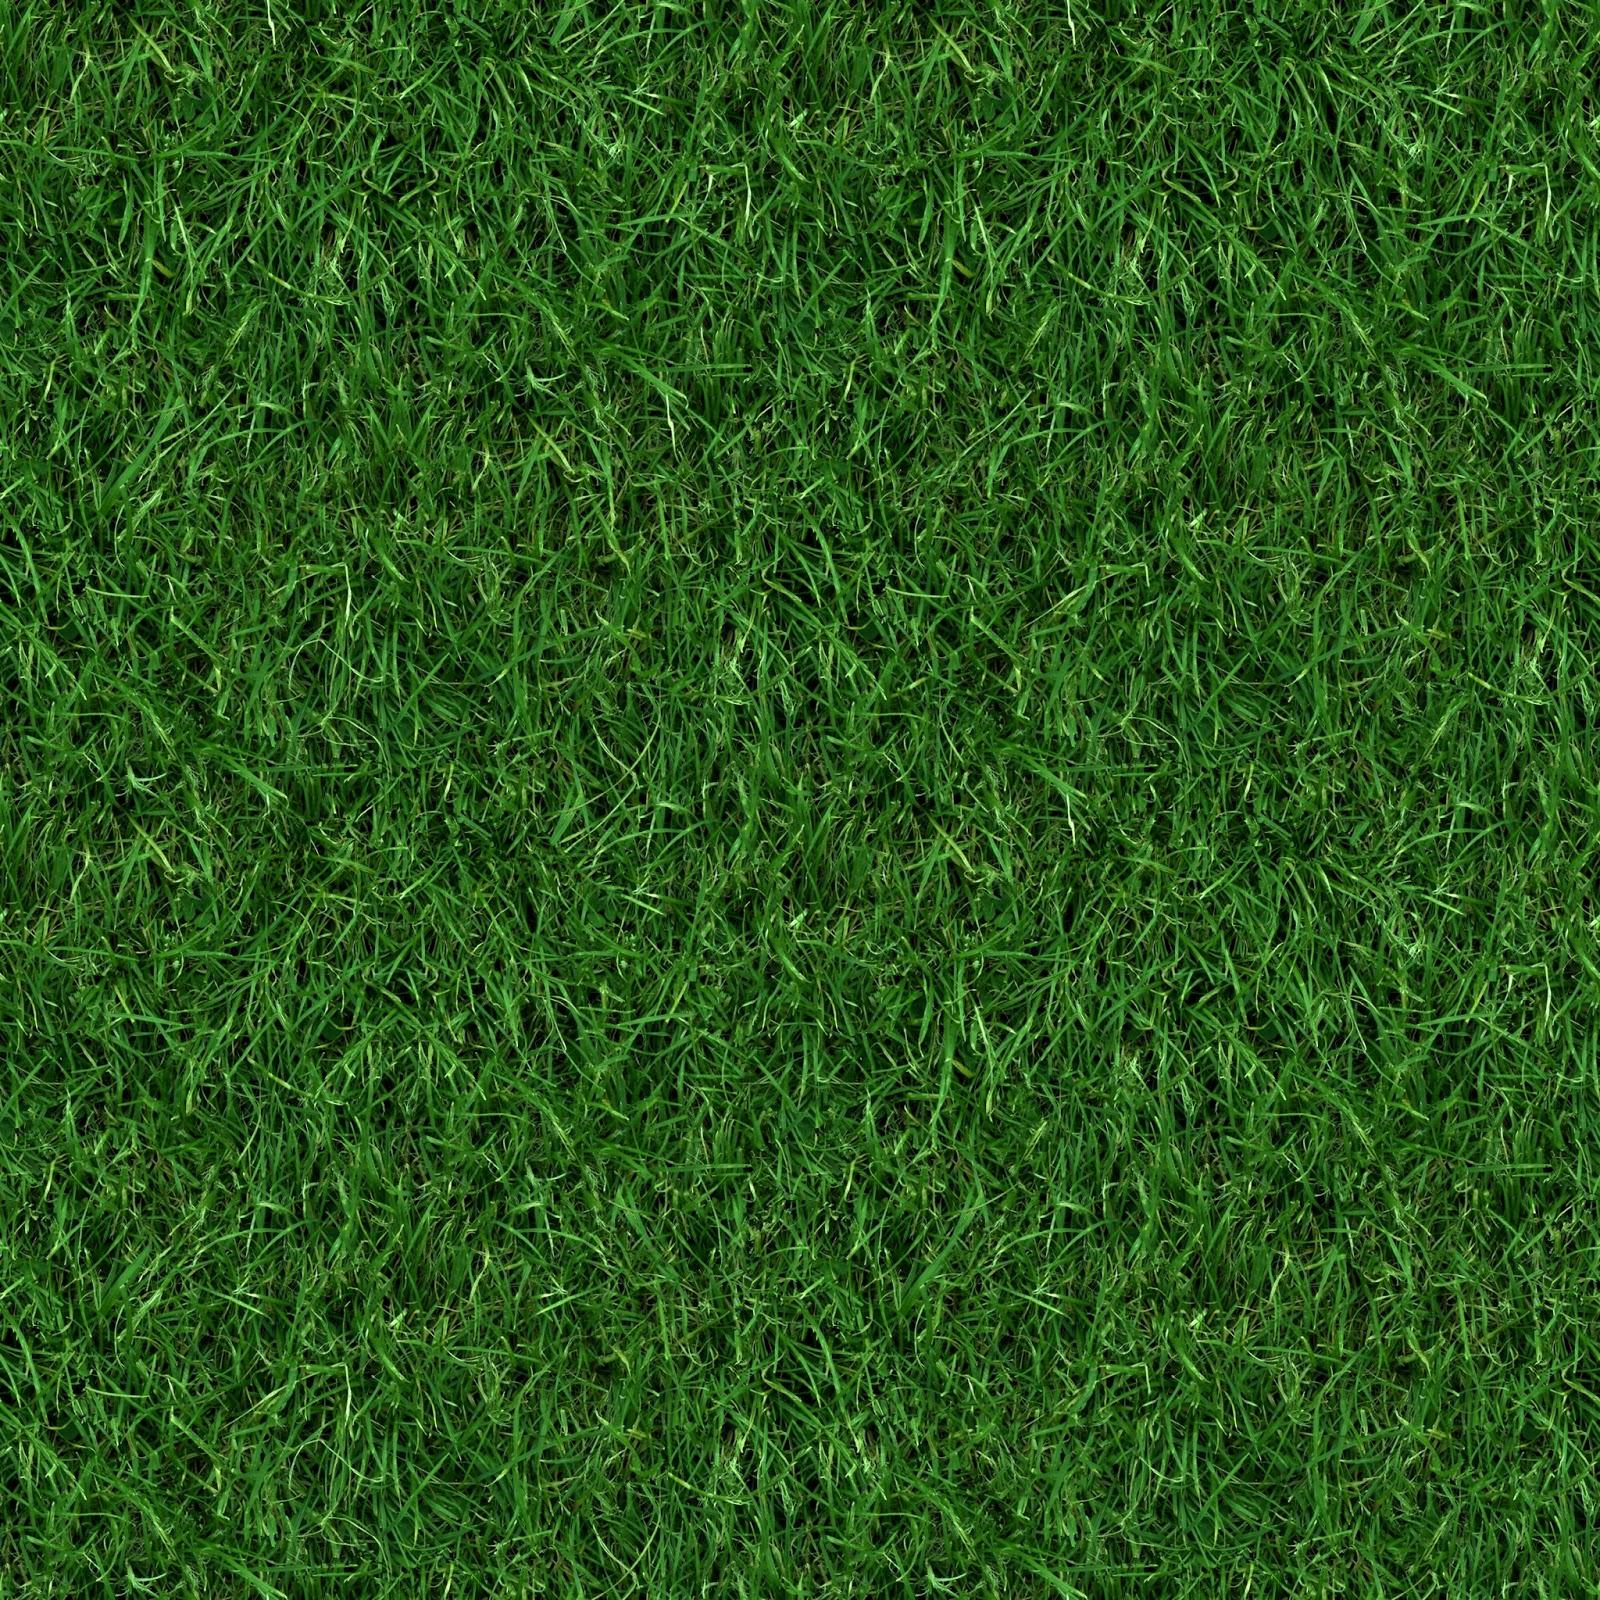 High Resolution Seamless Textures: (GRASS 4) seamless turf lawn ...